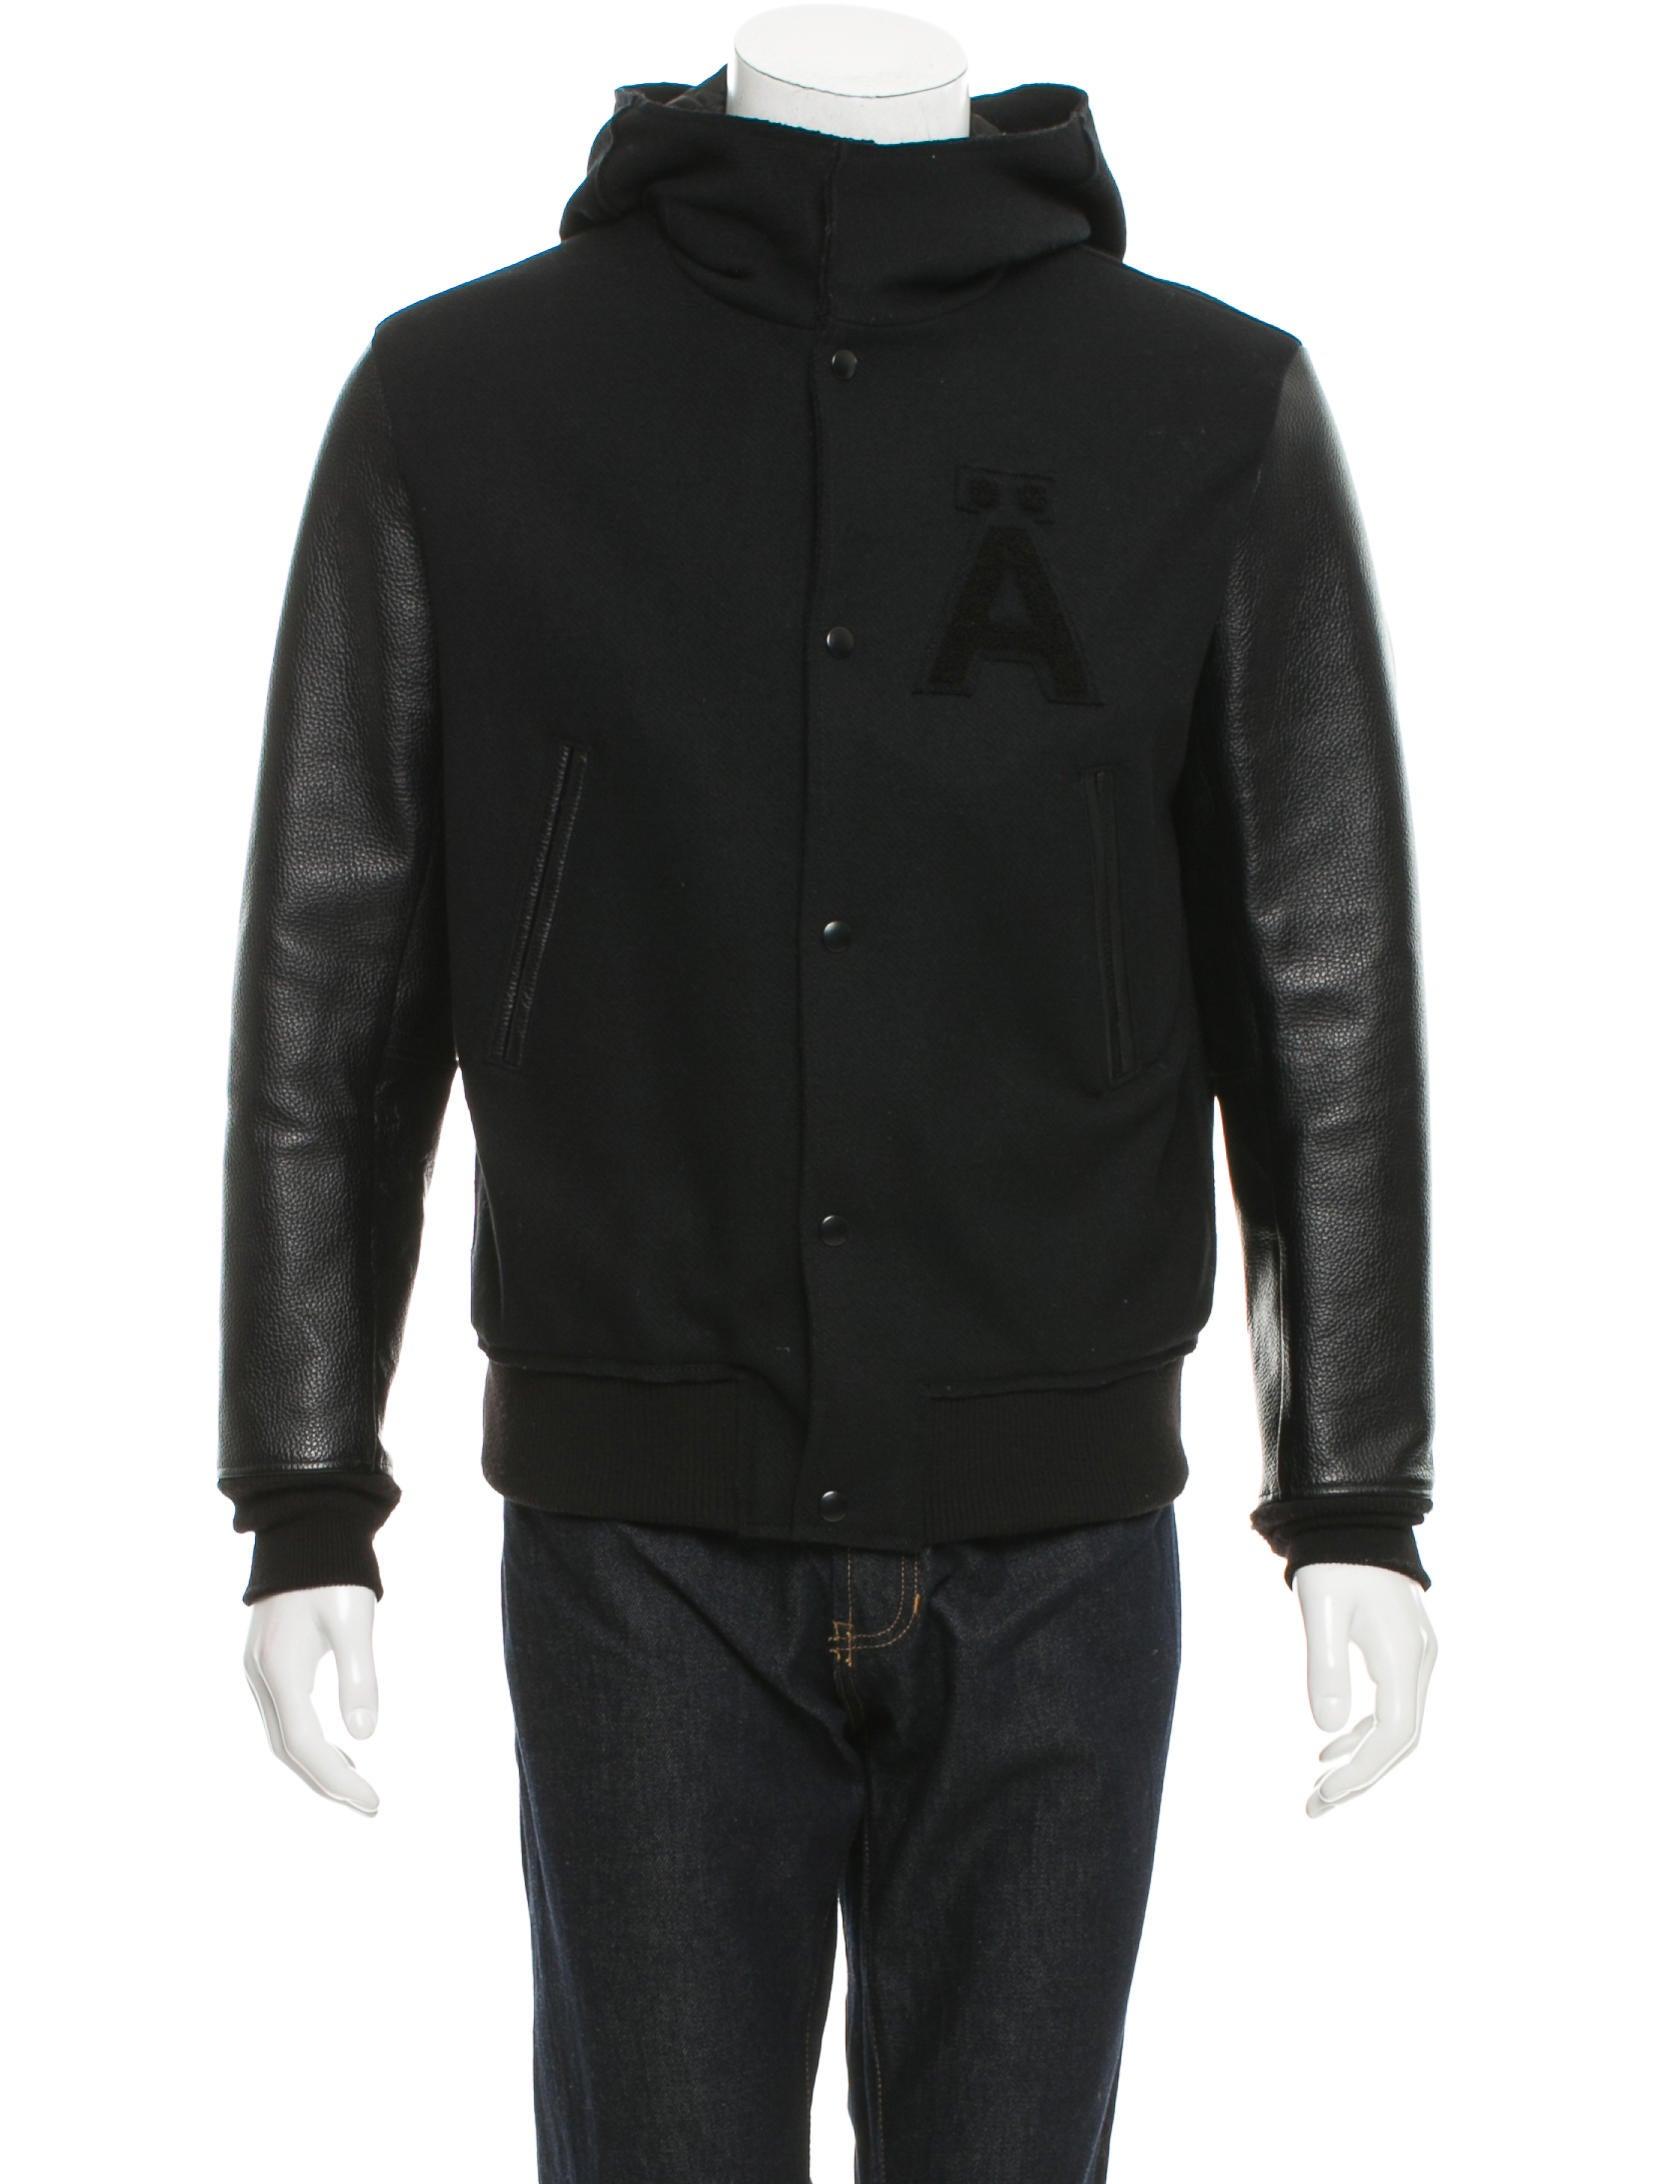 Wool and leather varsity jacket